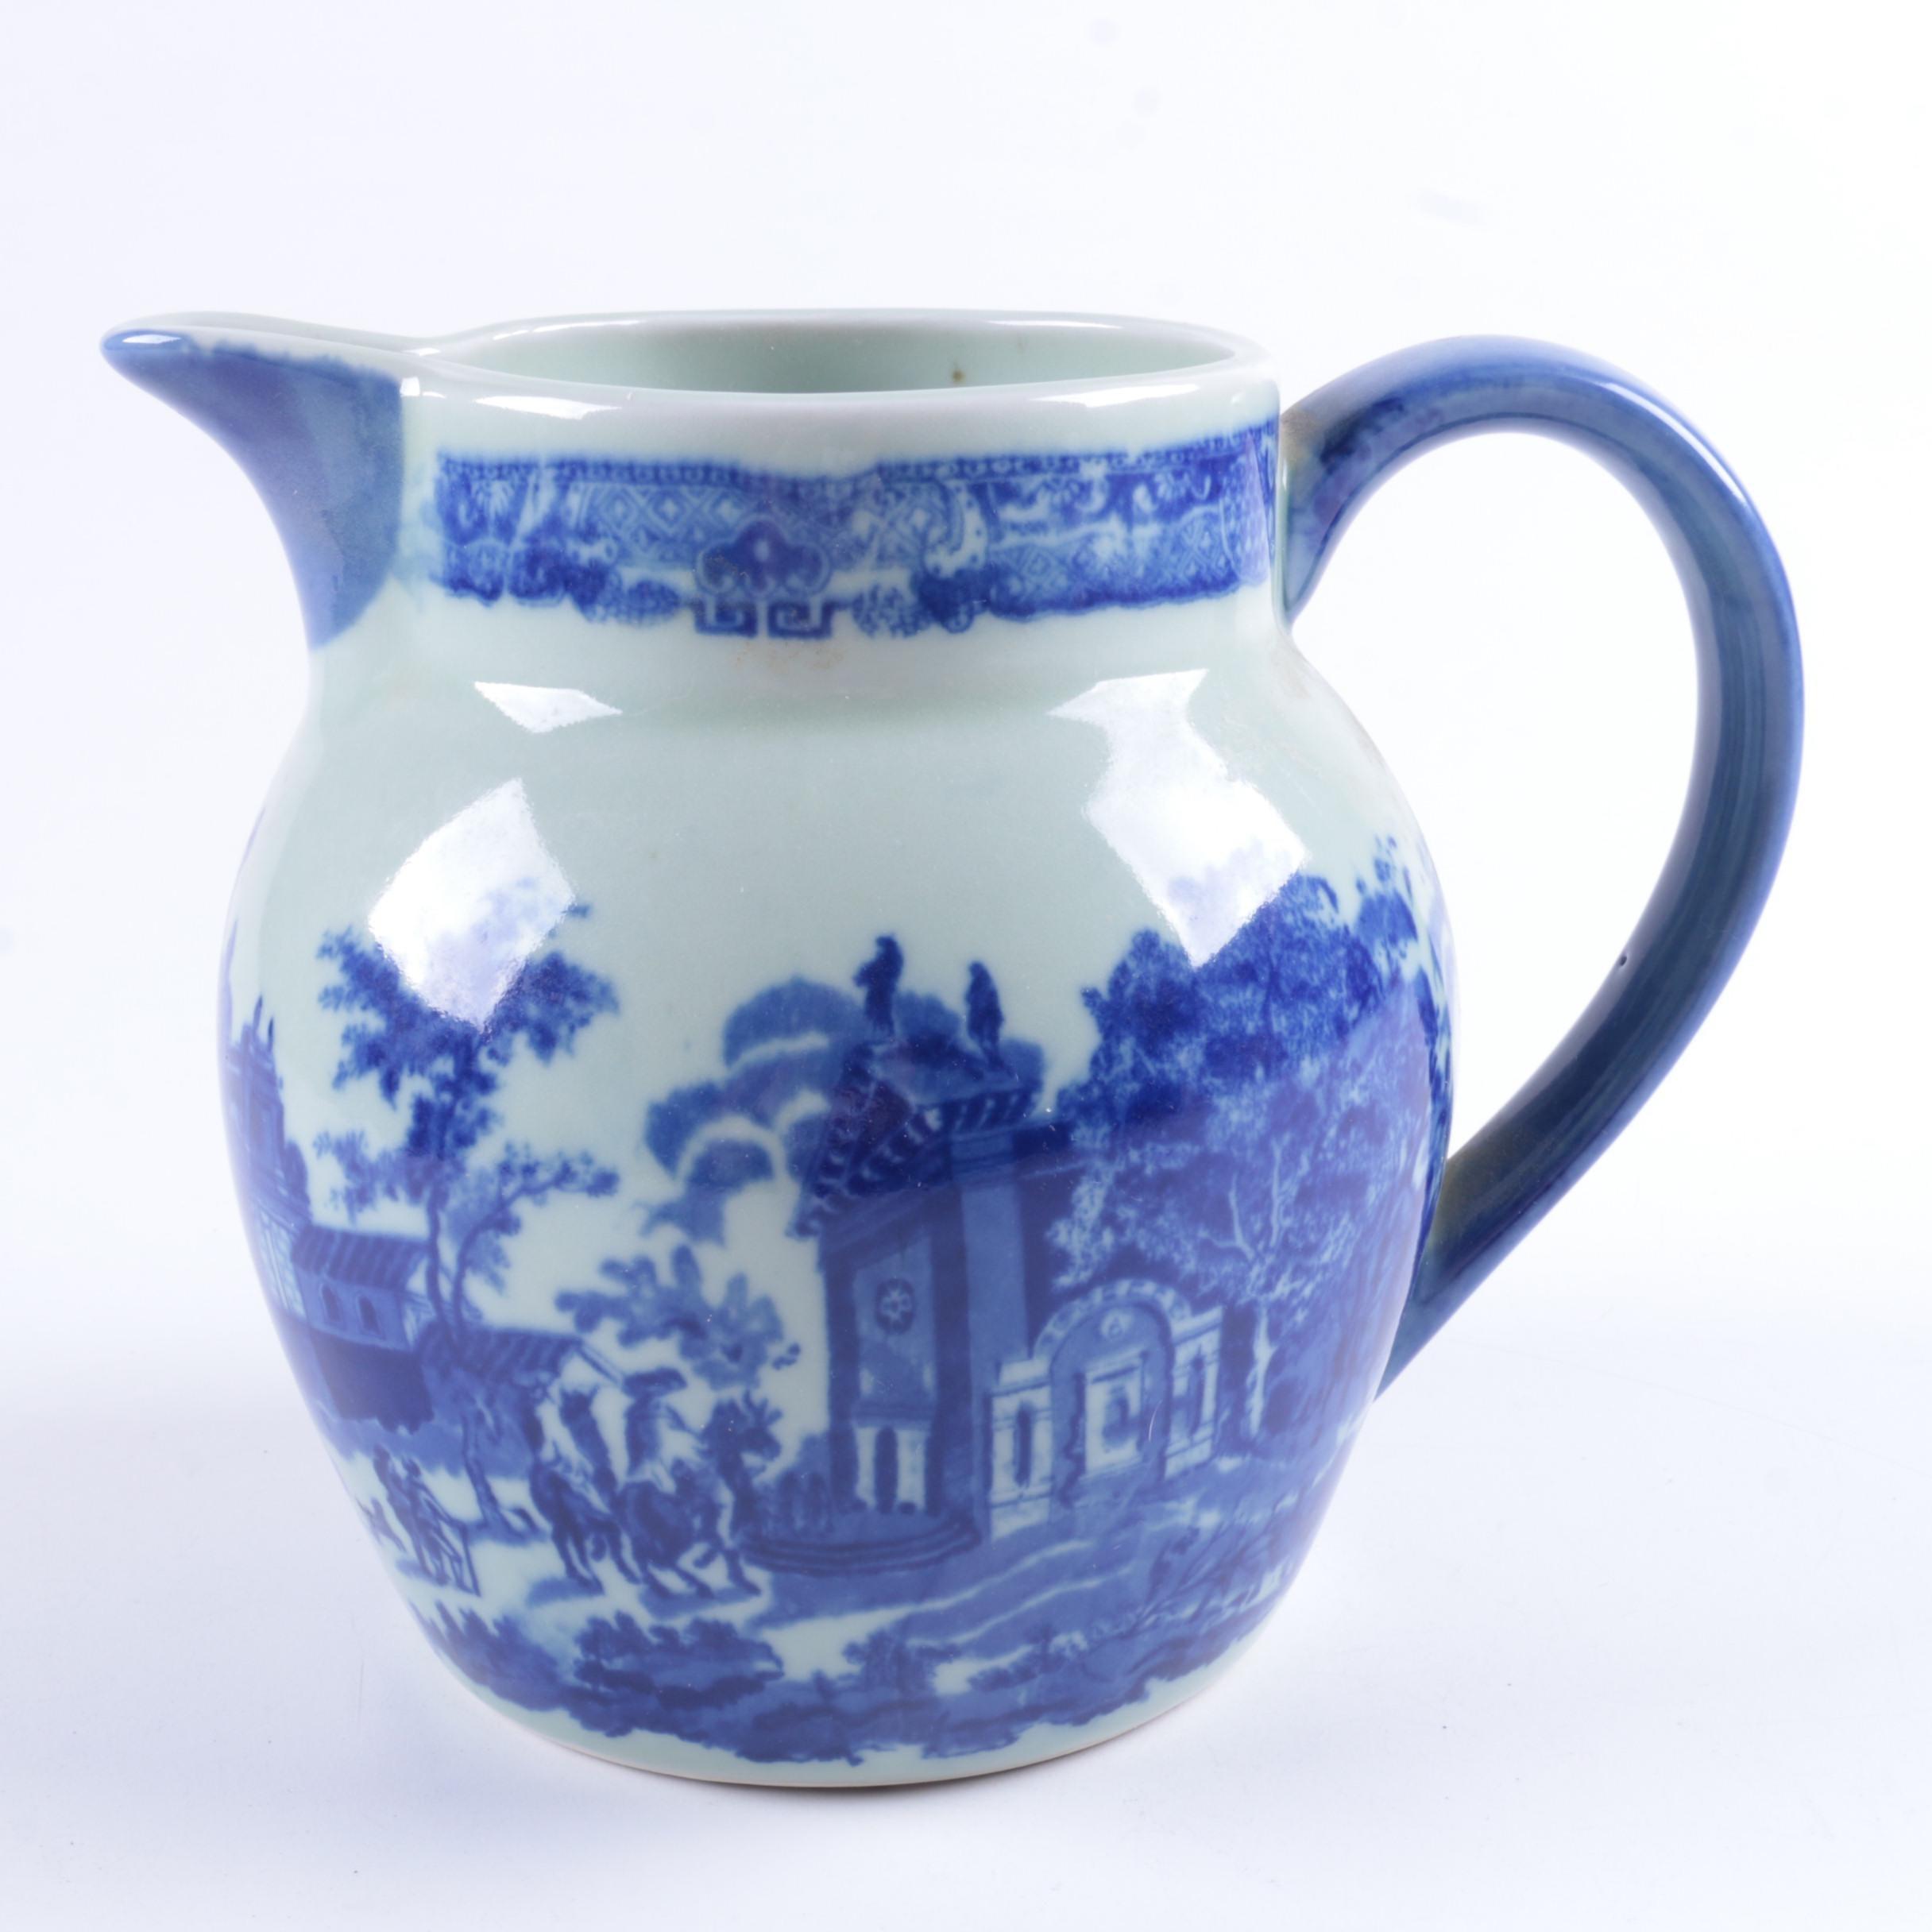 Decorative Blue and White Ceramic Pitcher